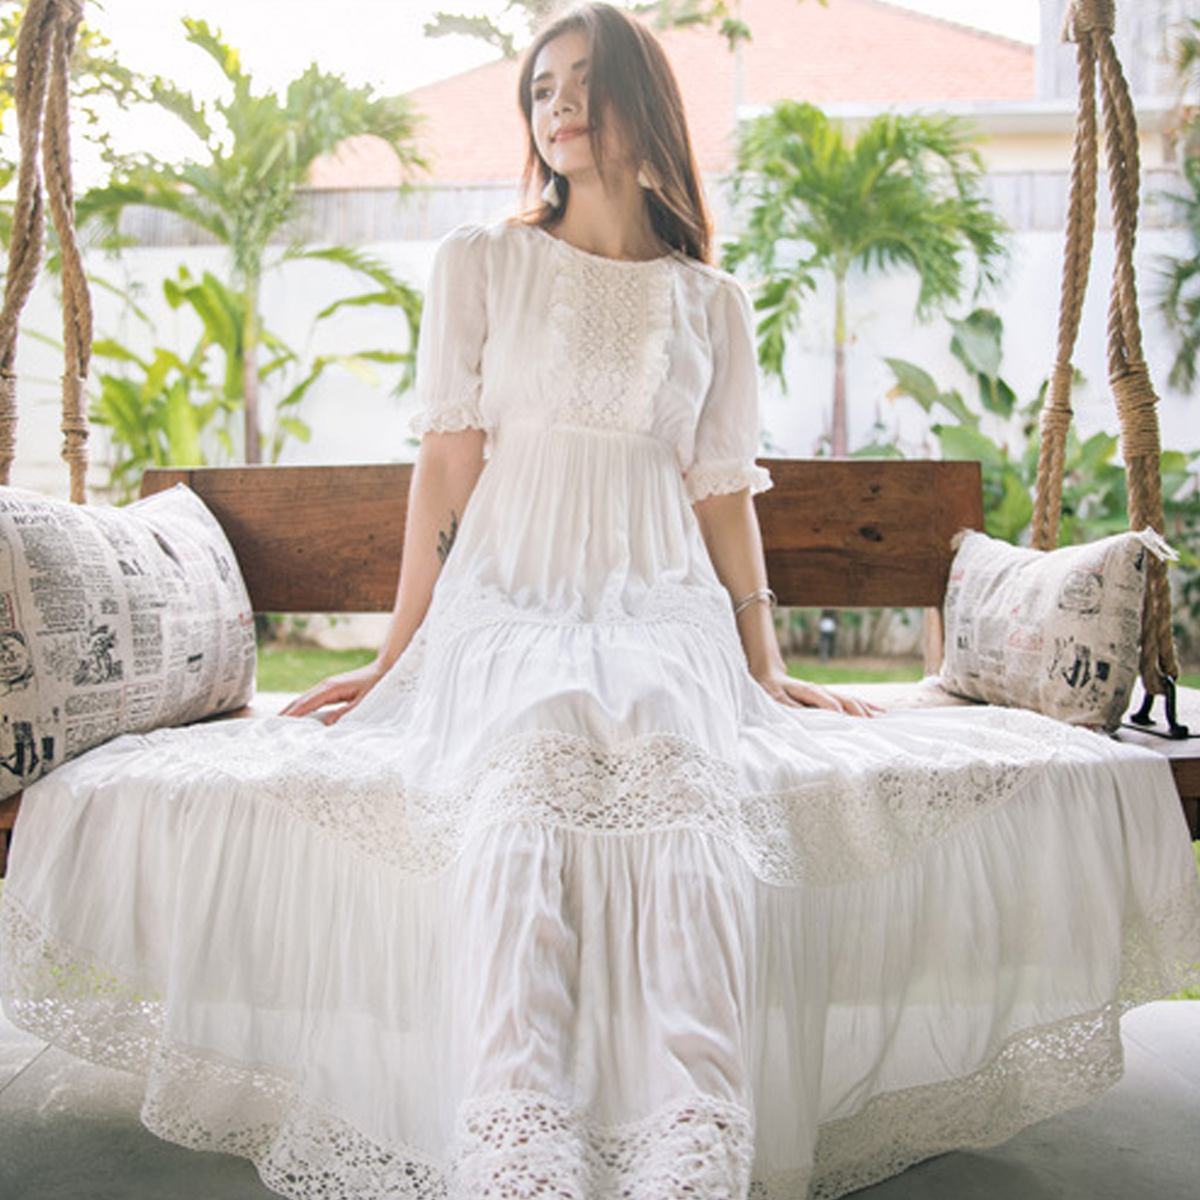 Jastie Bohemian Hippie Big Swing Holiday Beach Dress O Neck Half Sleeve Spring Summer Dresses Women